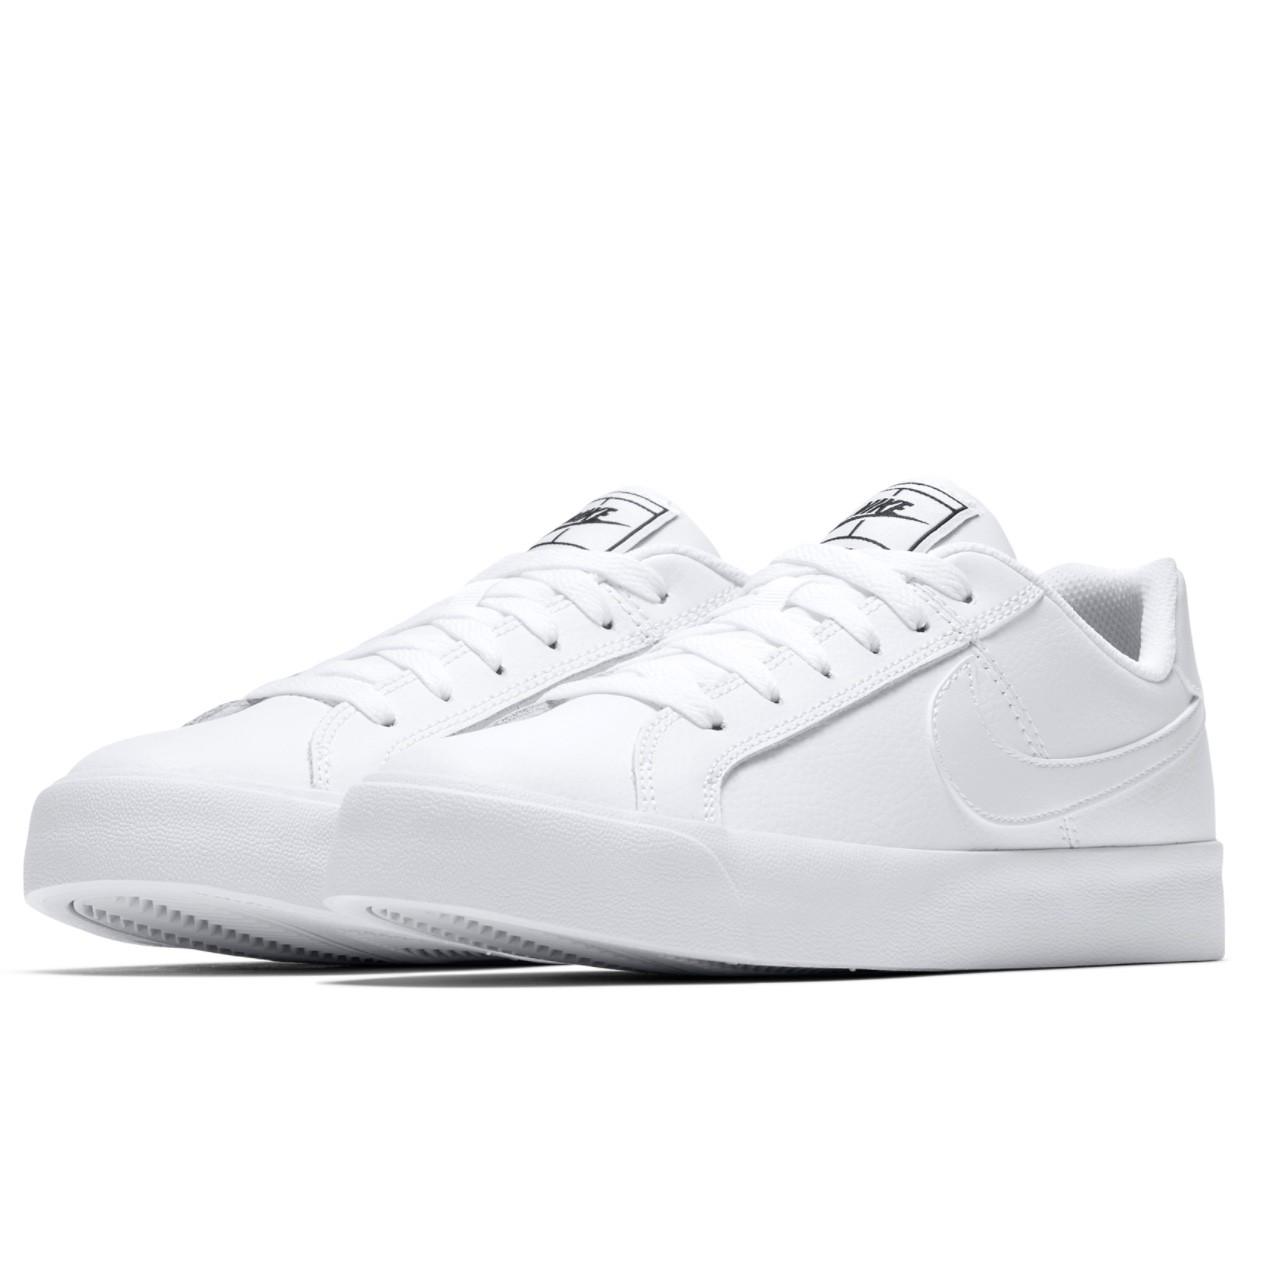 NIKE 耐克 COURT ROYALE AC AO2810 女子运动鞋